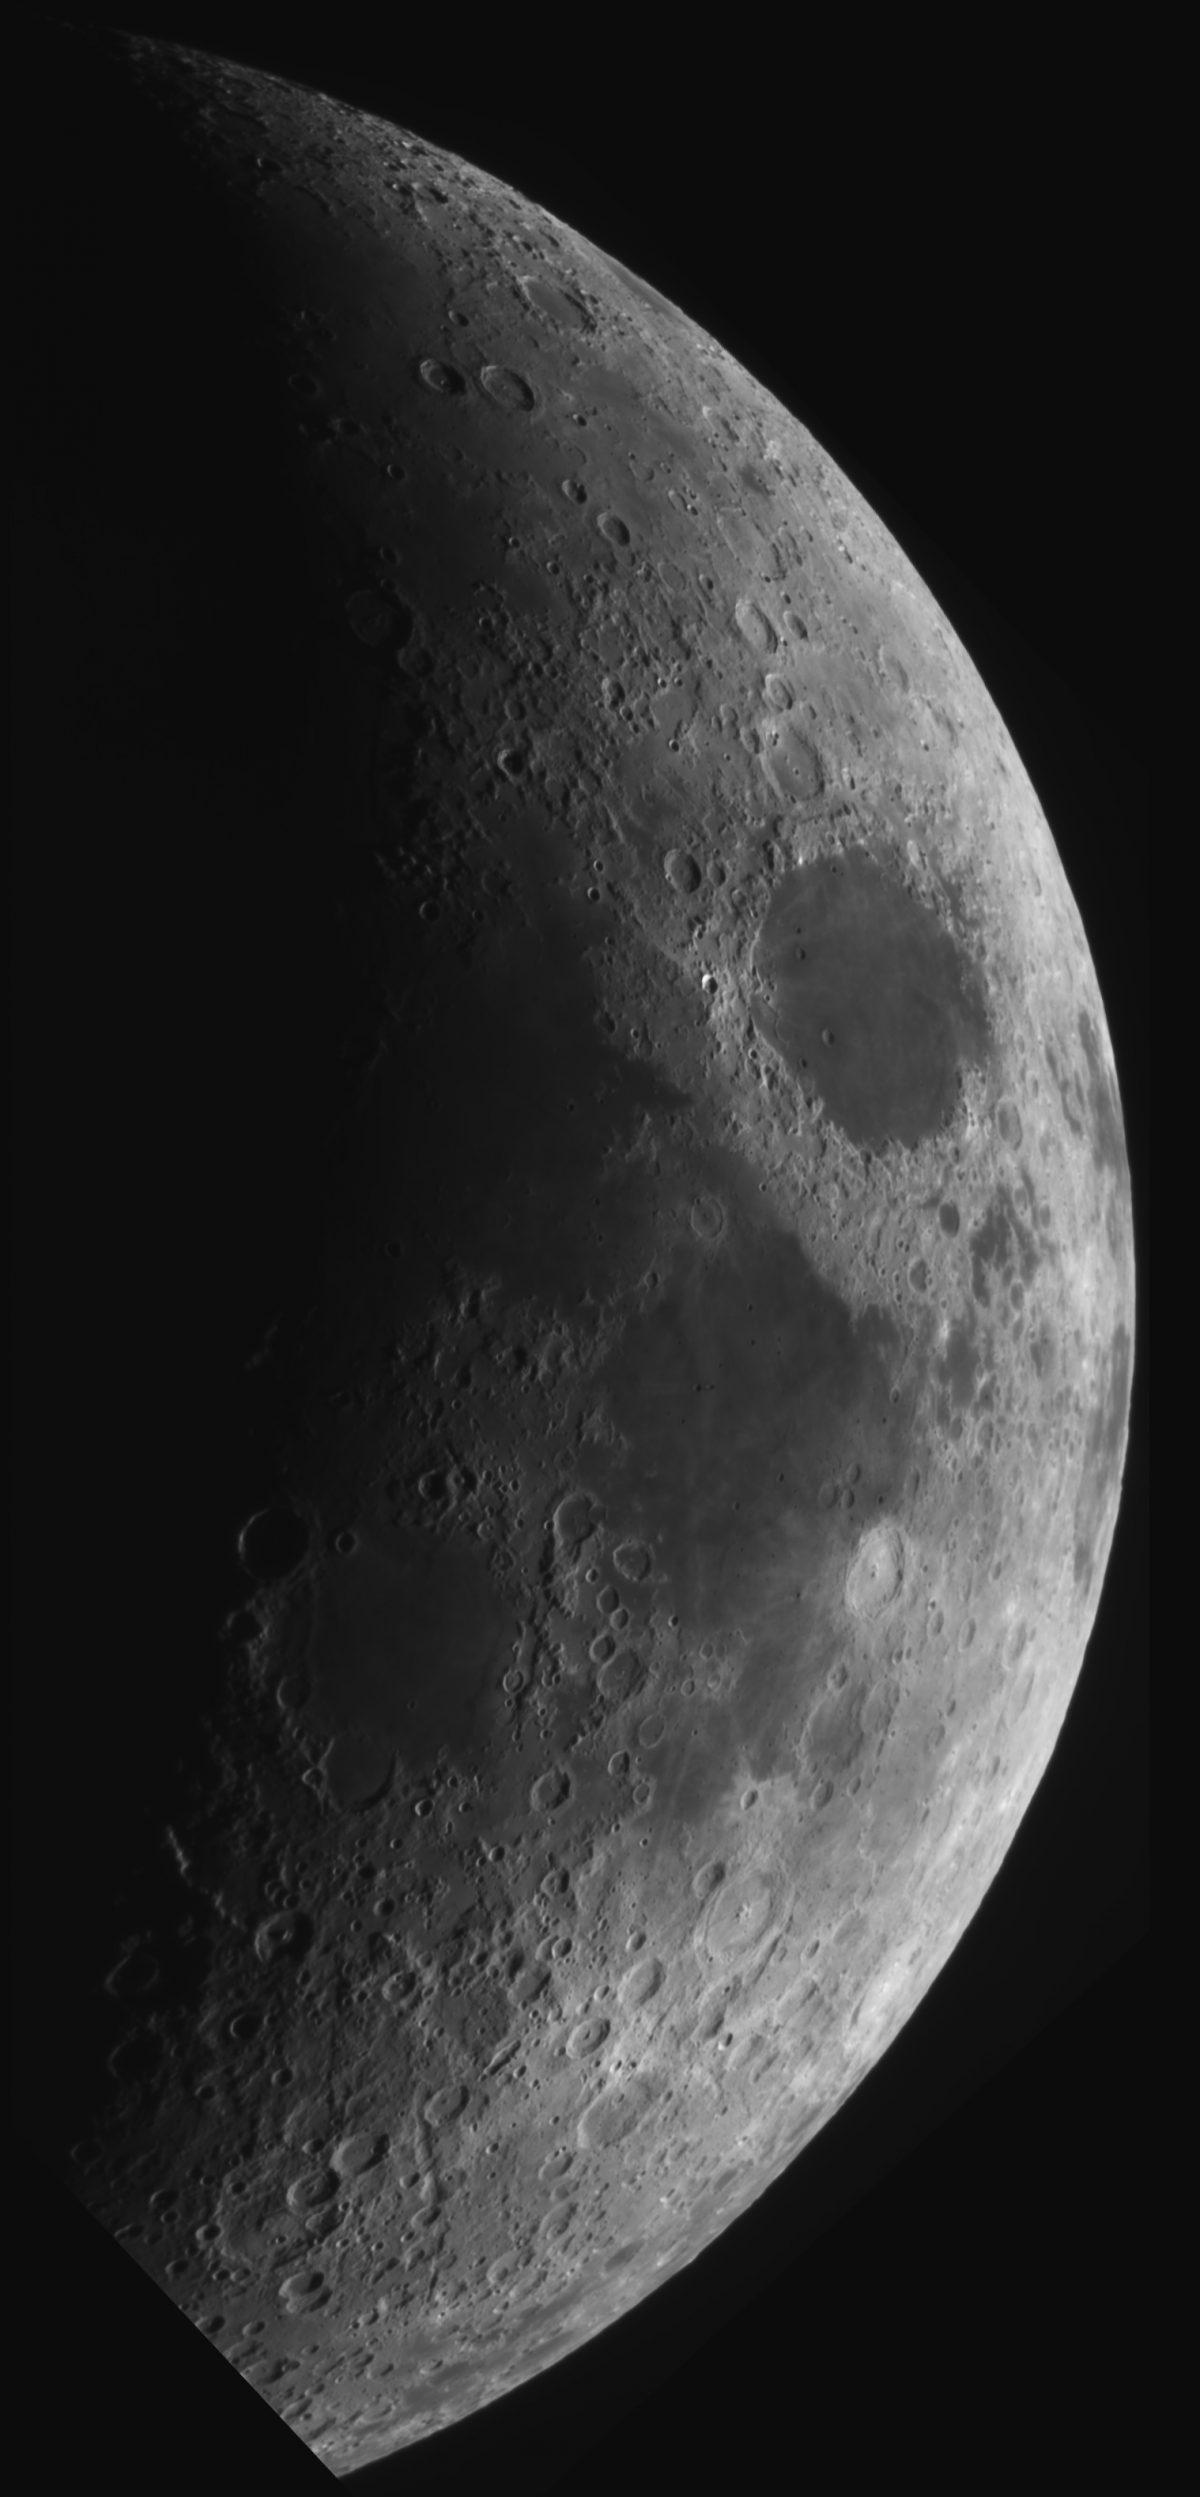 Infrared Lunar Mosaic